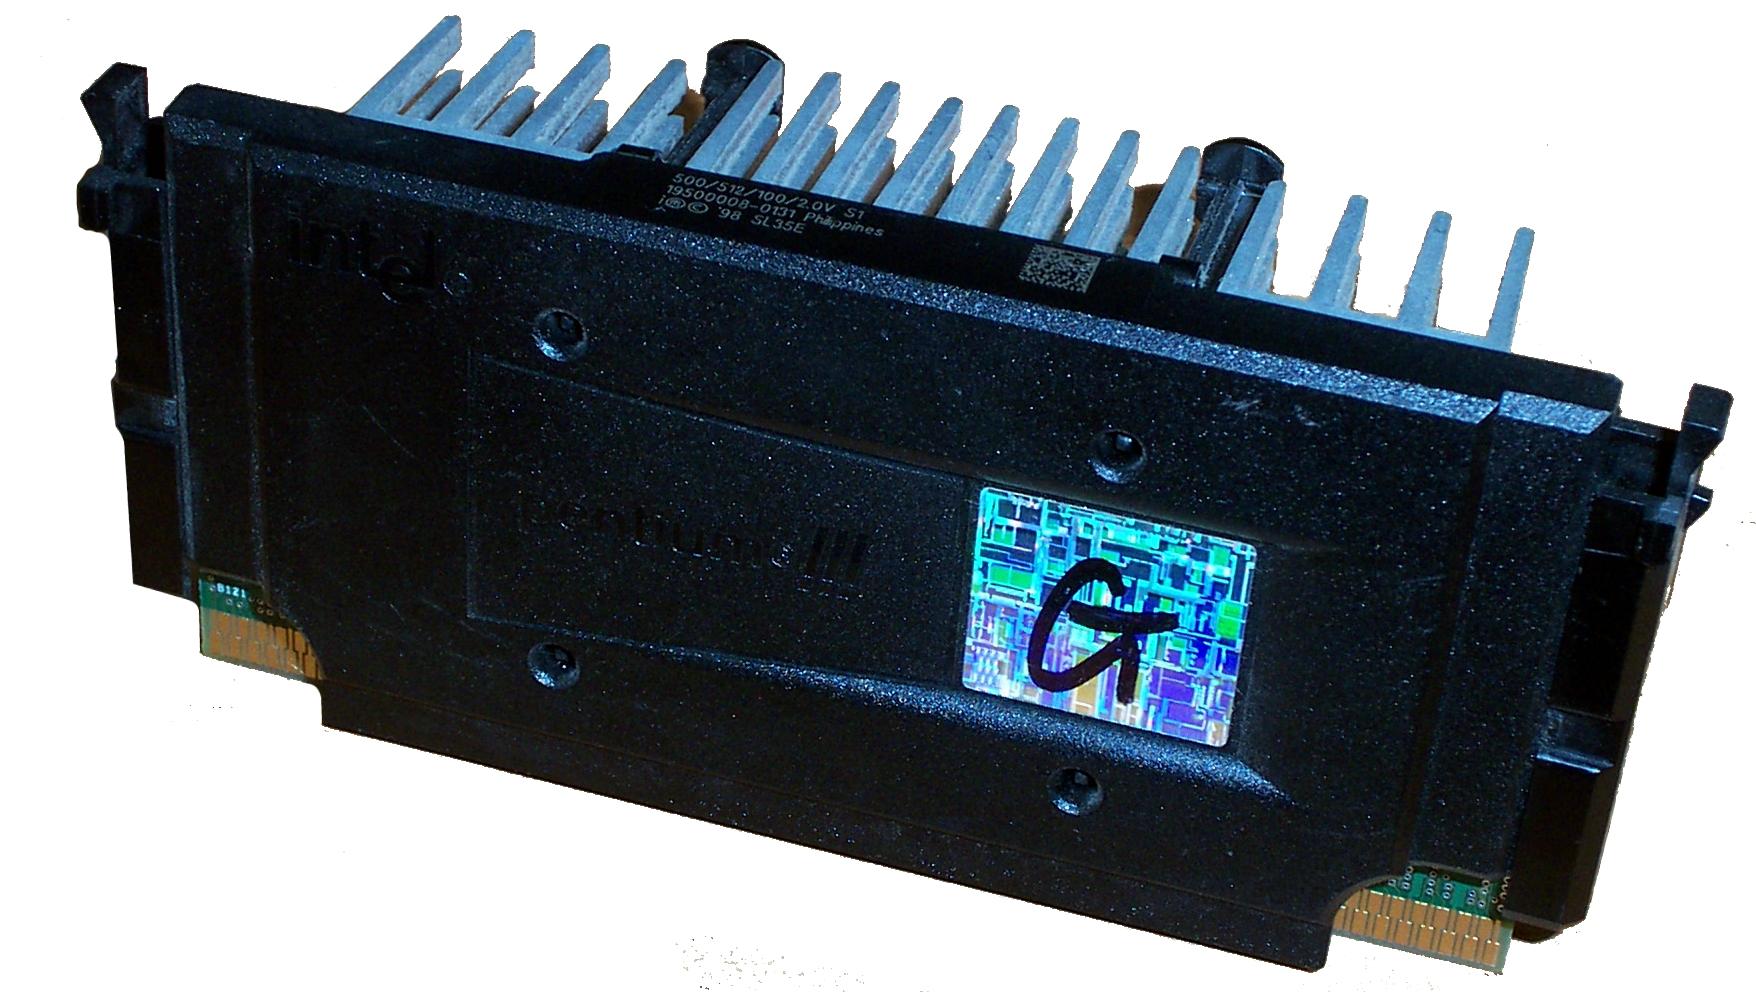 Intel SL35E Pentium 3 500Mhz /512KB/100MHz Slot 1 Processor with Heatsink